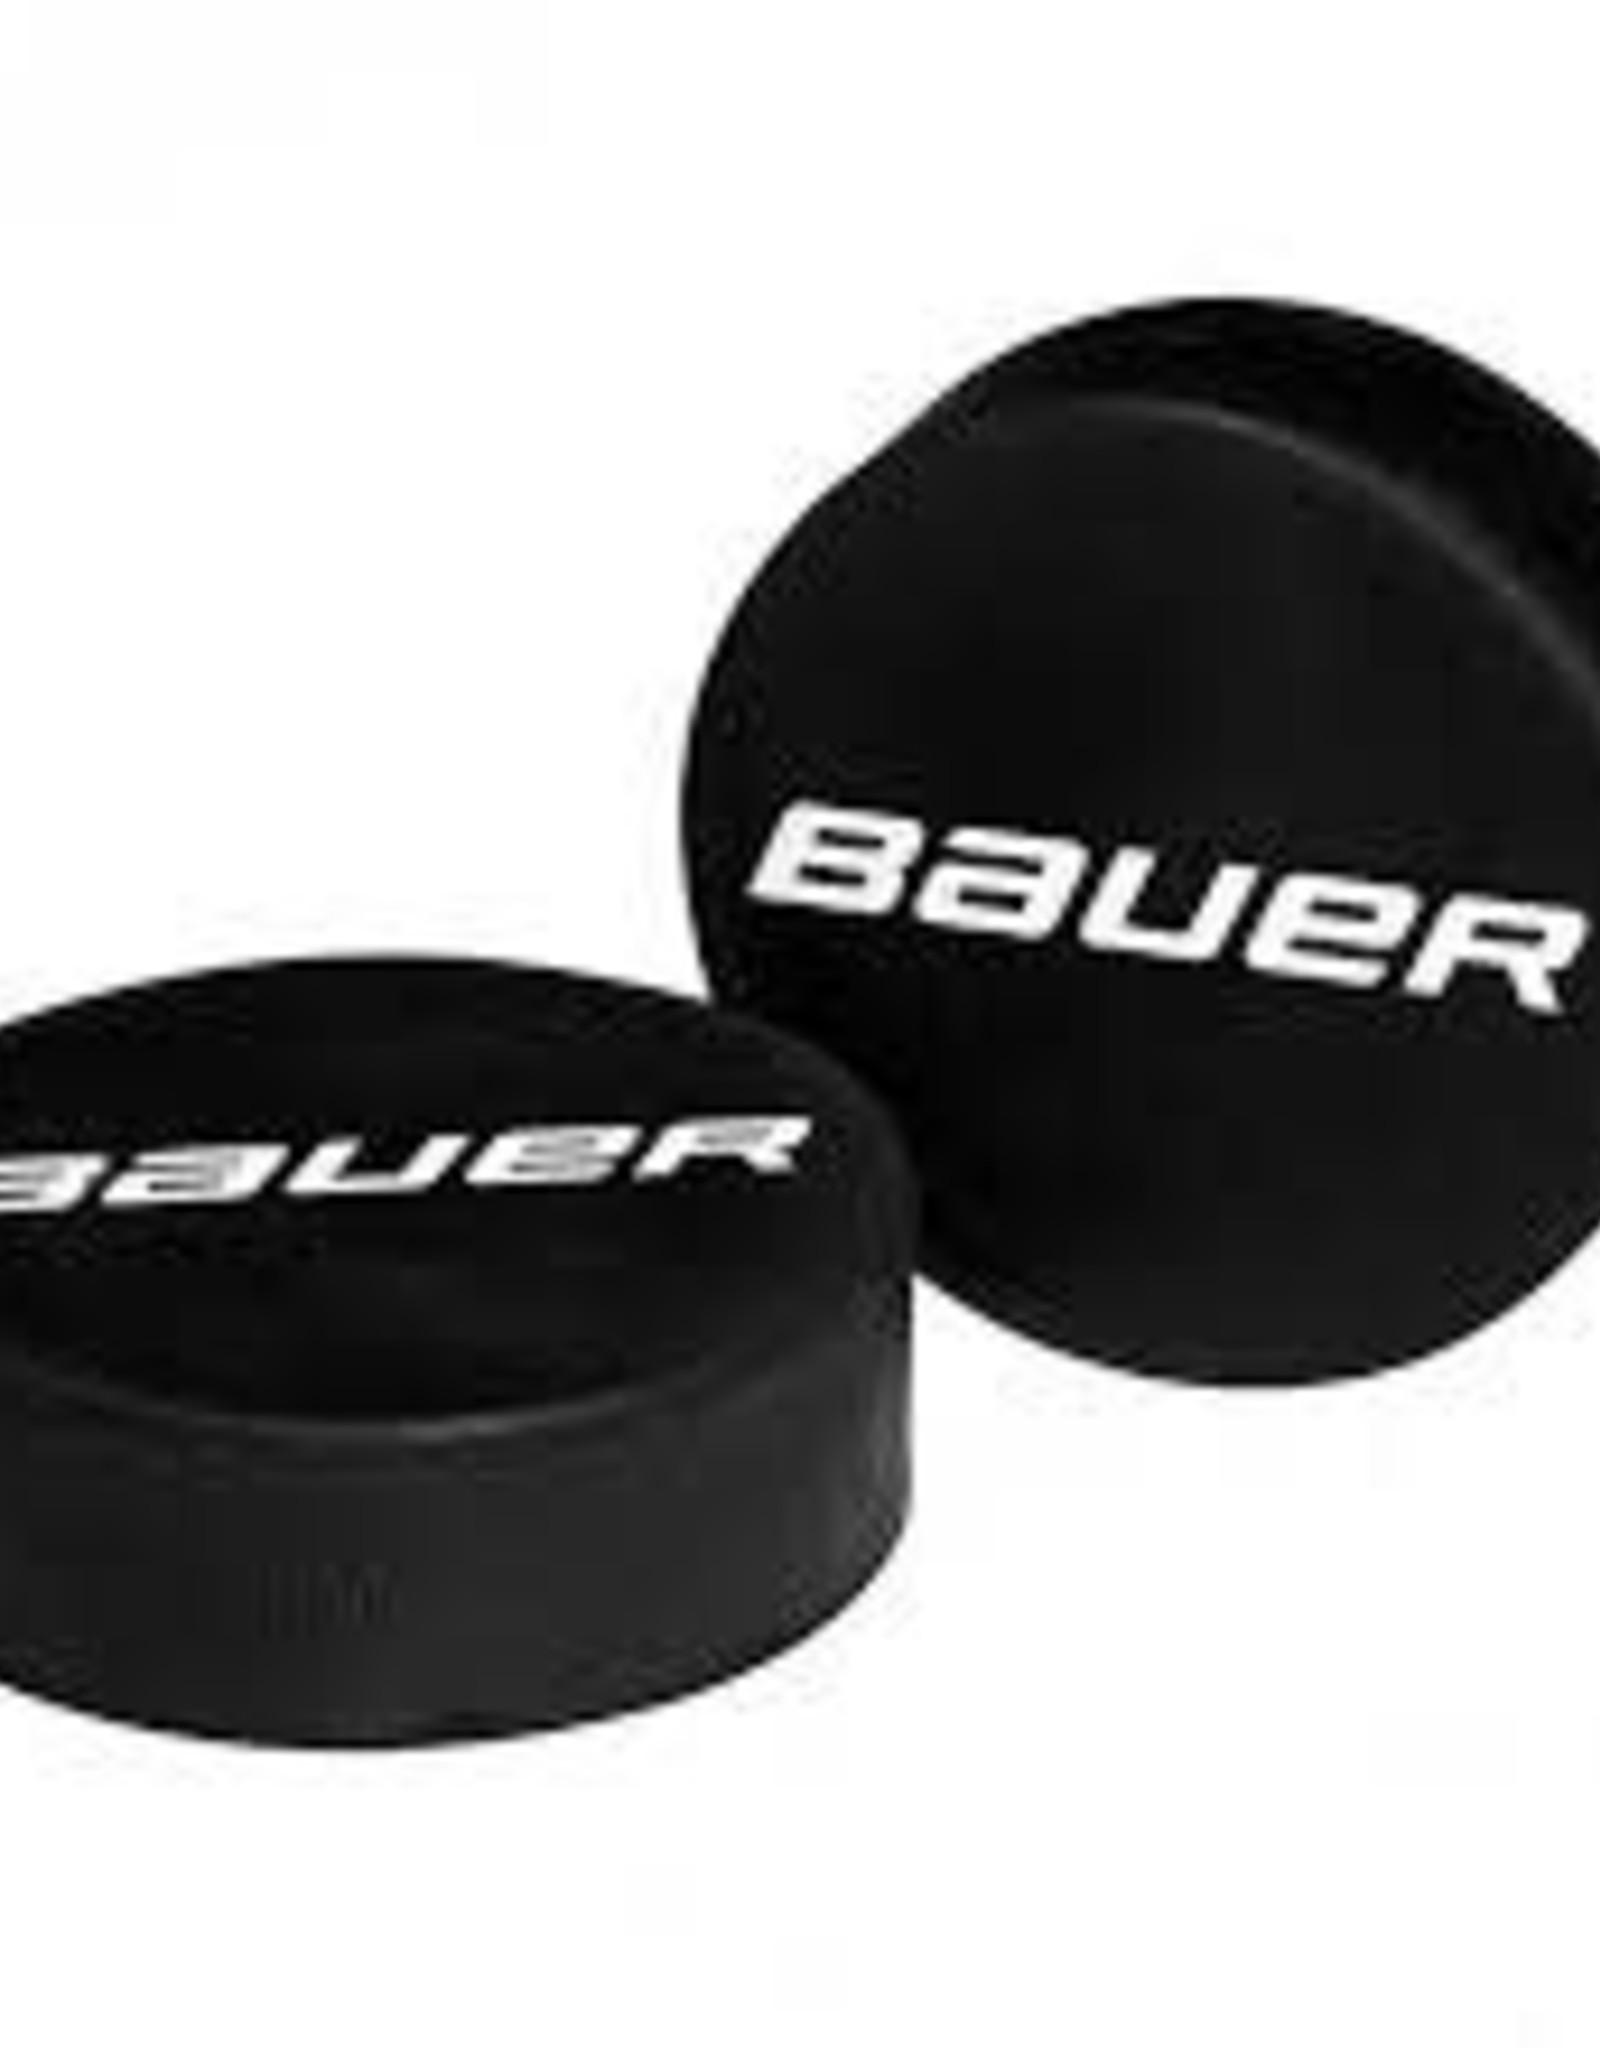 Bauer Hockey BAUER PUCKS - 100 UNIT PACK-PACK